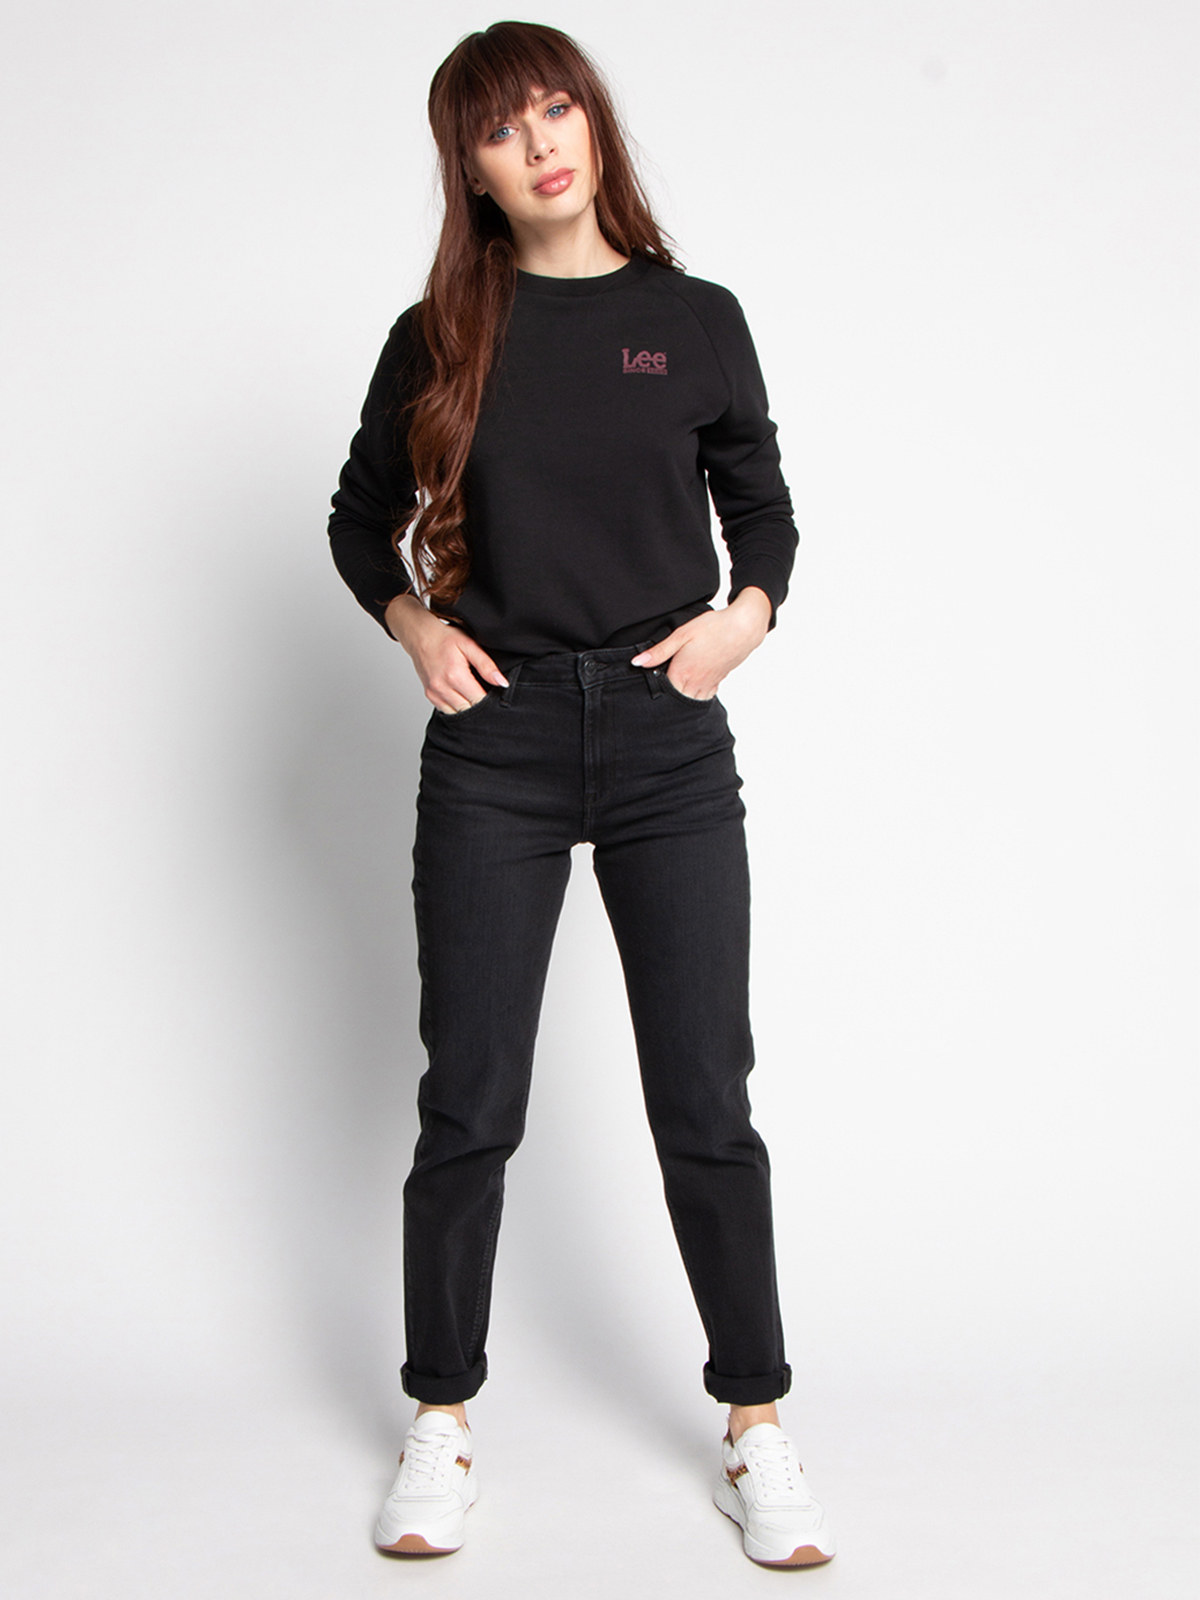 Lee Sweatshirt mit Logoprint schwarz | Dress for less